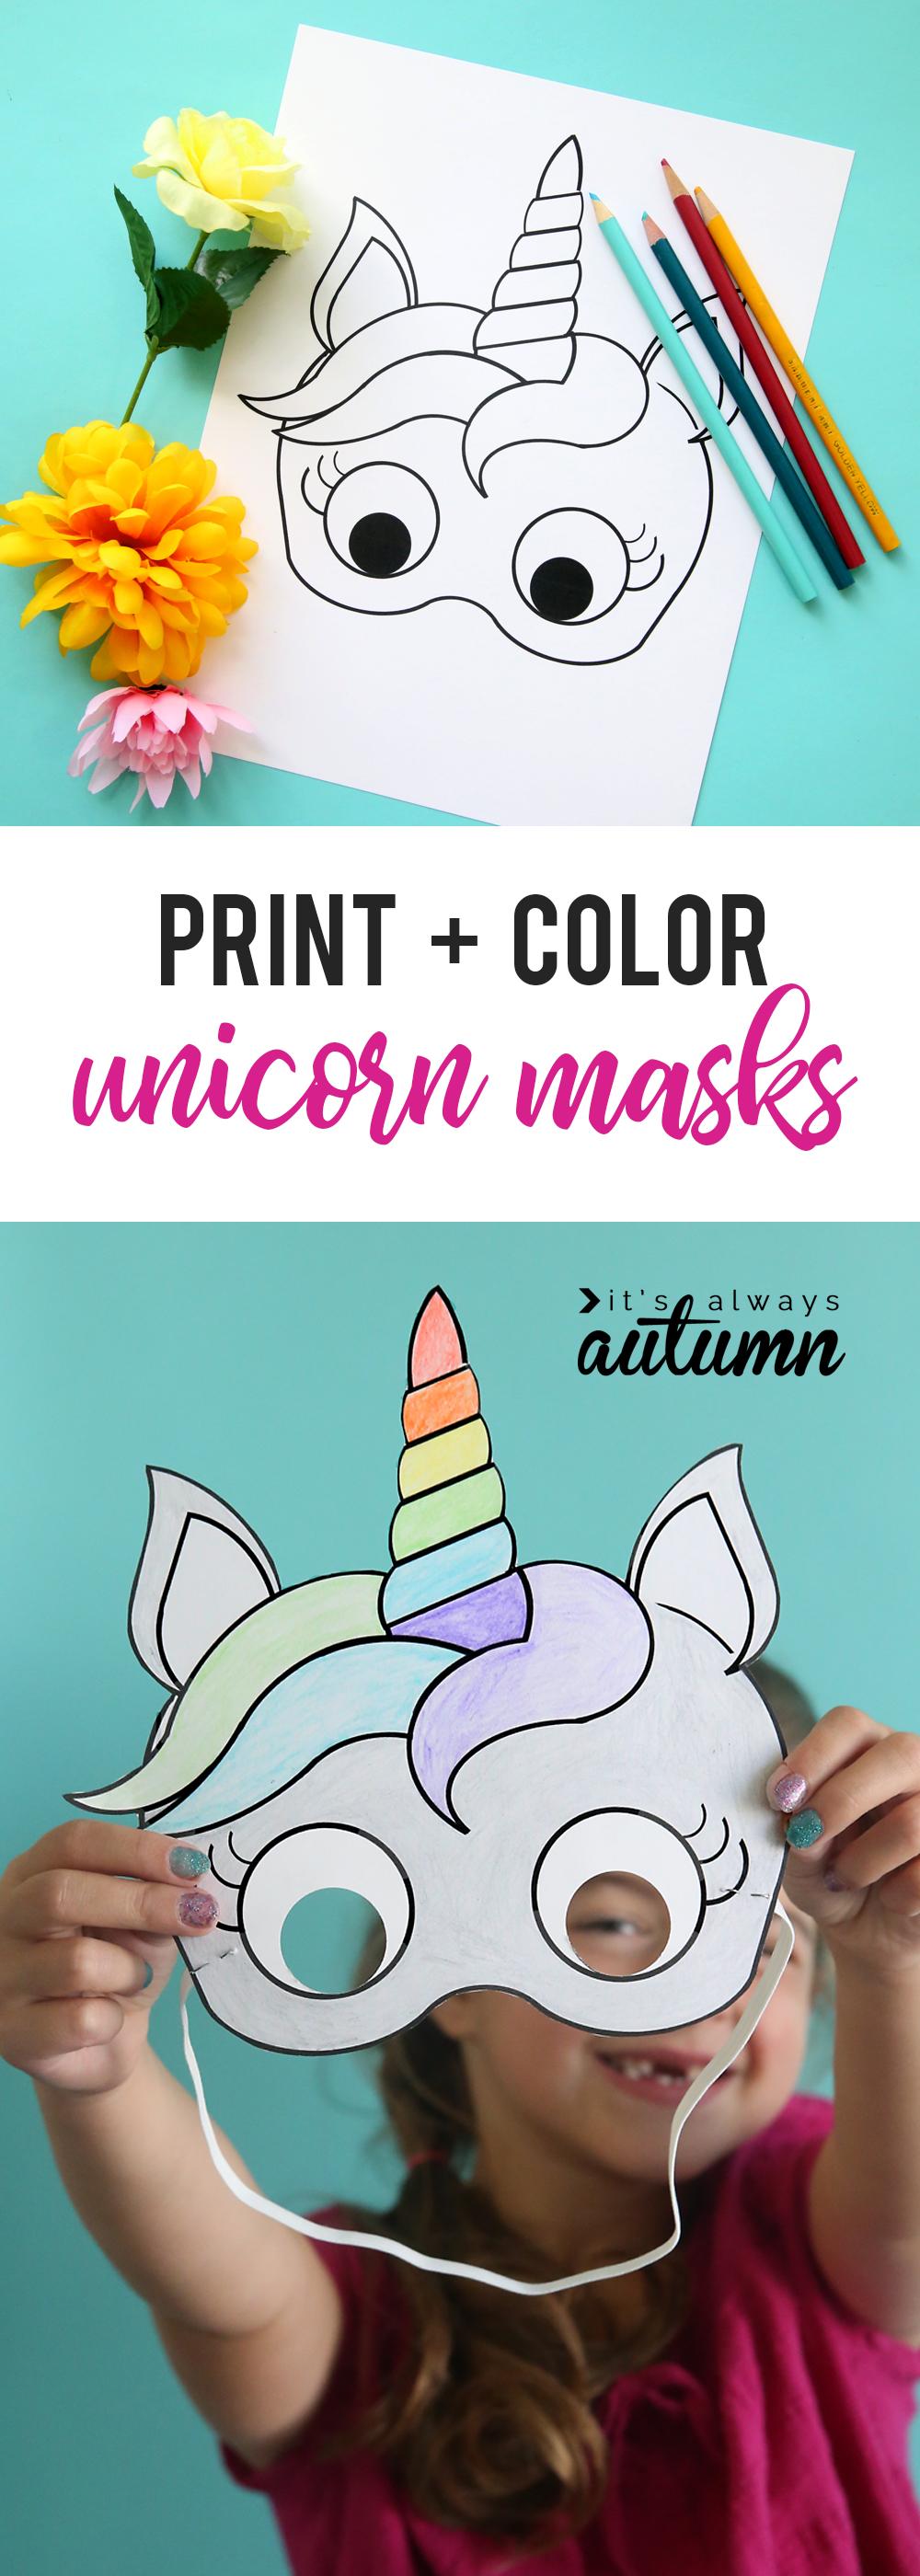 It is an image of Comprehensive Unicorn Mask Printable